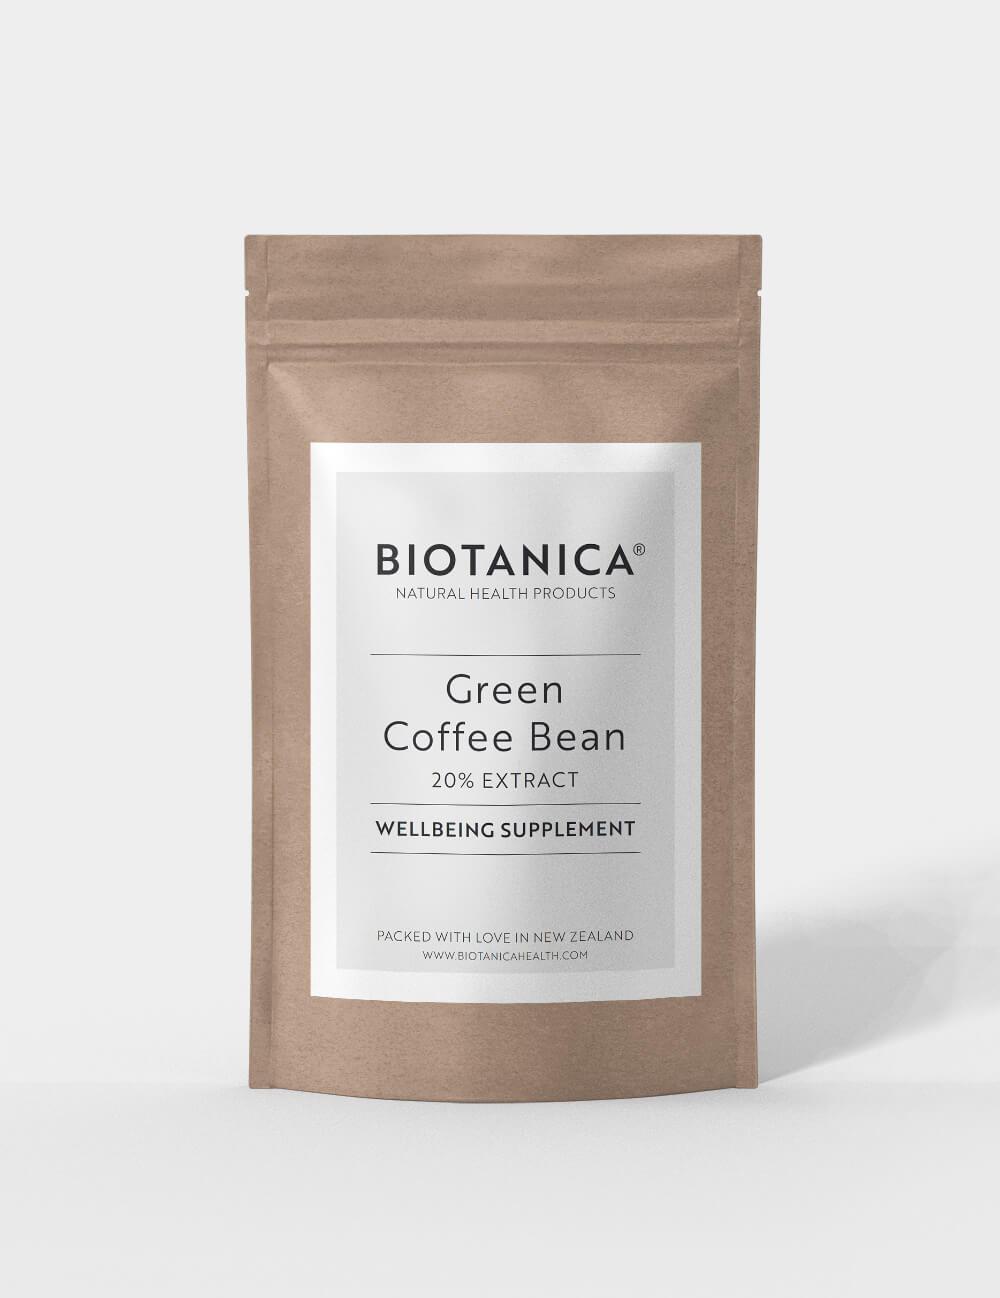 Green Coffee Bean Image 1